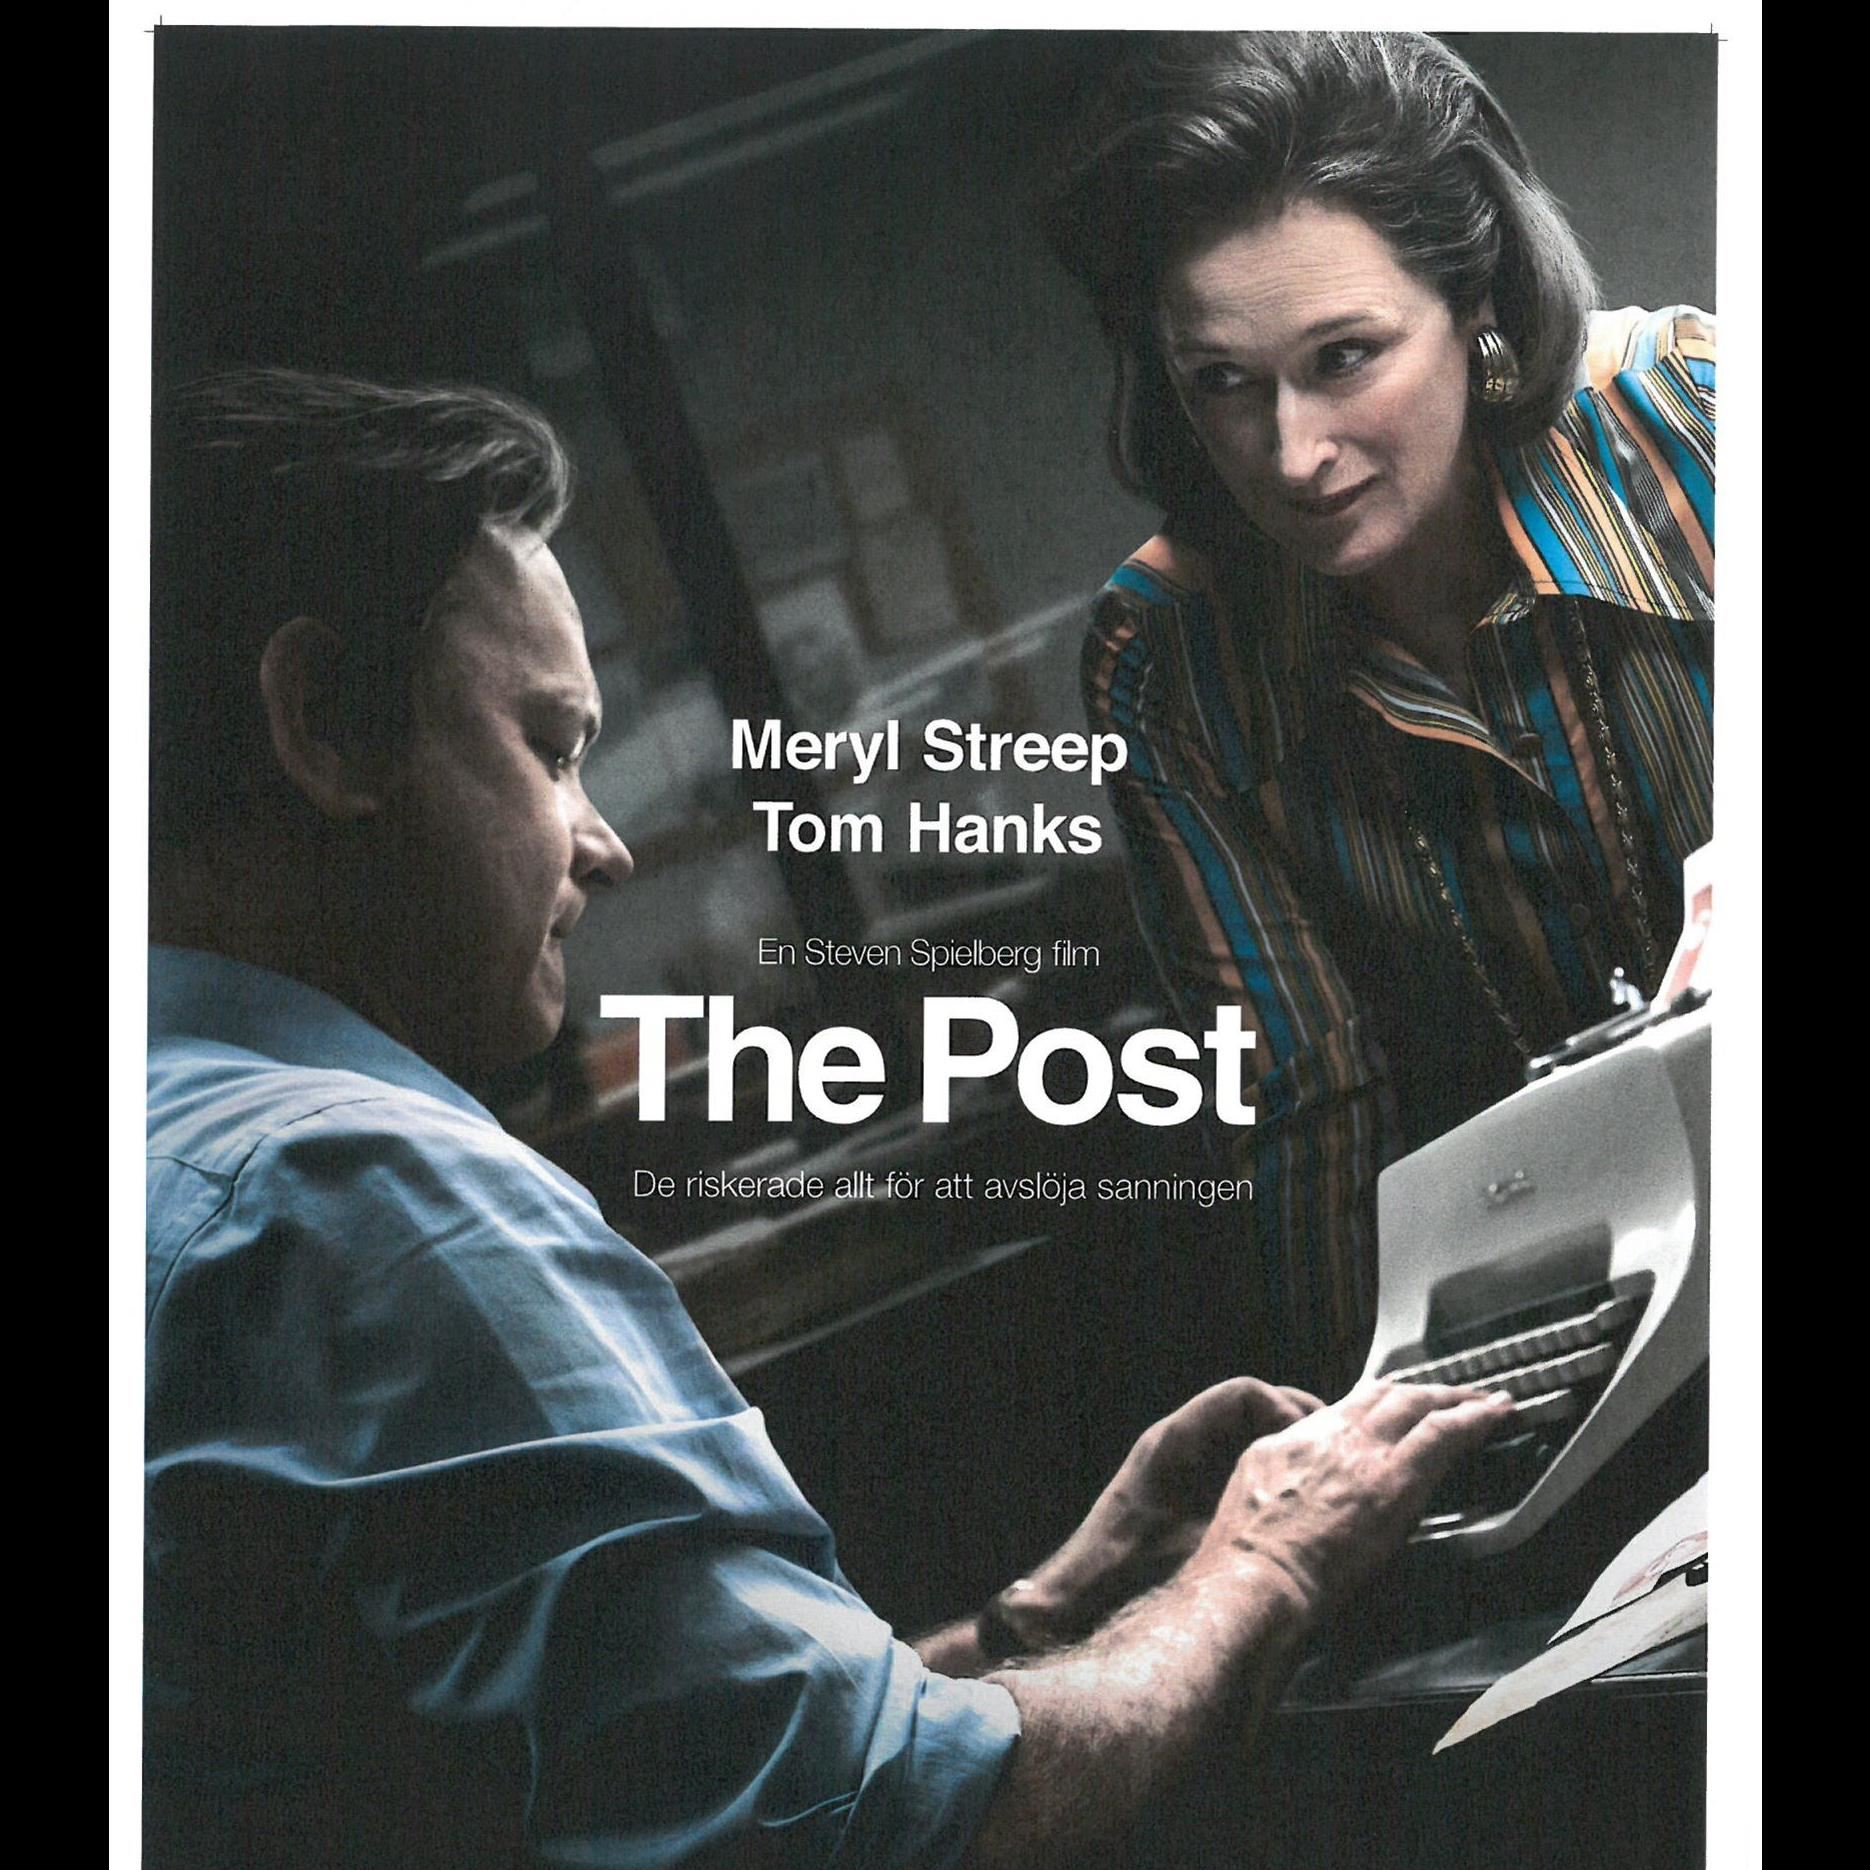 Film för daglediga - The Post